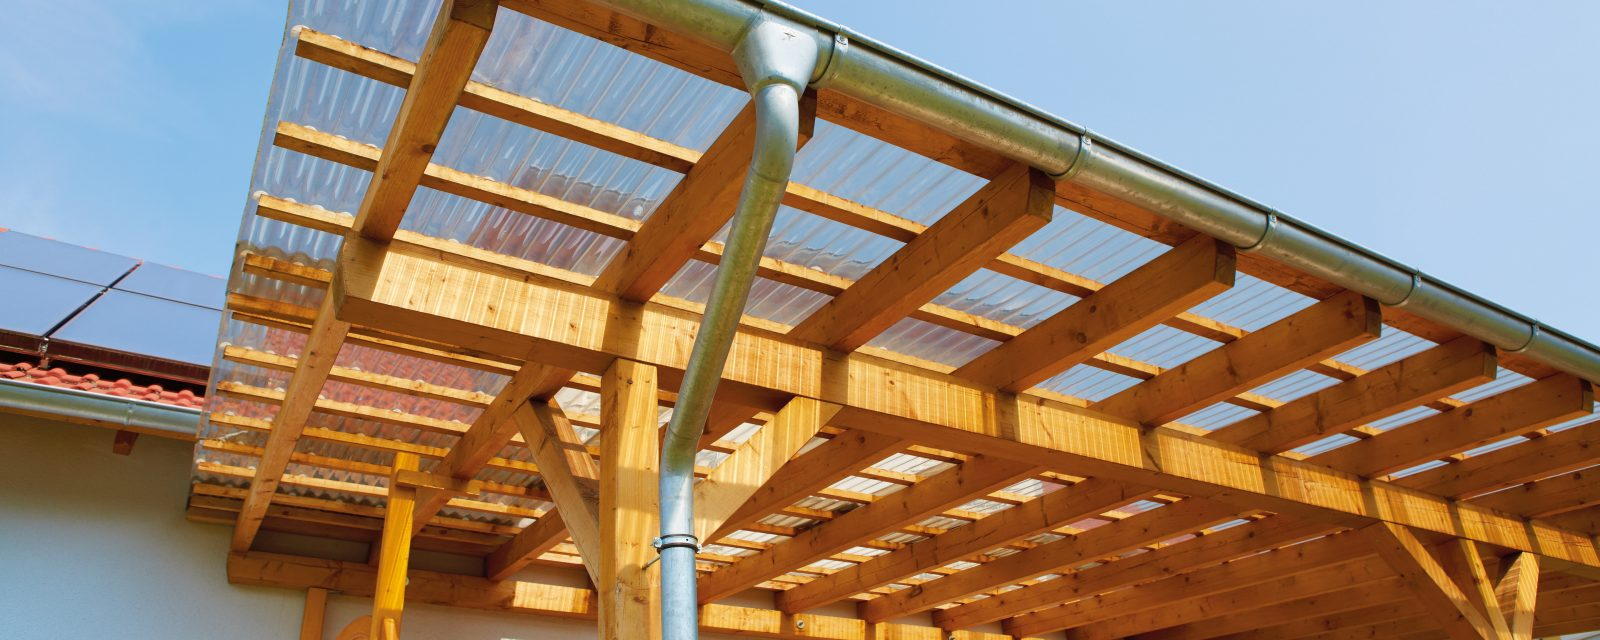 Balkonüberdachung mit Acryl Wellplatten klar